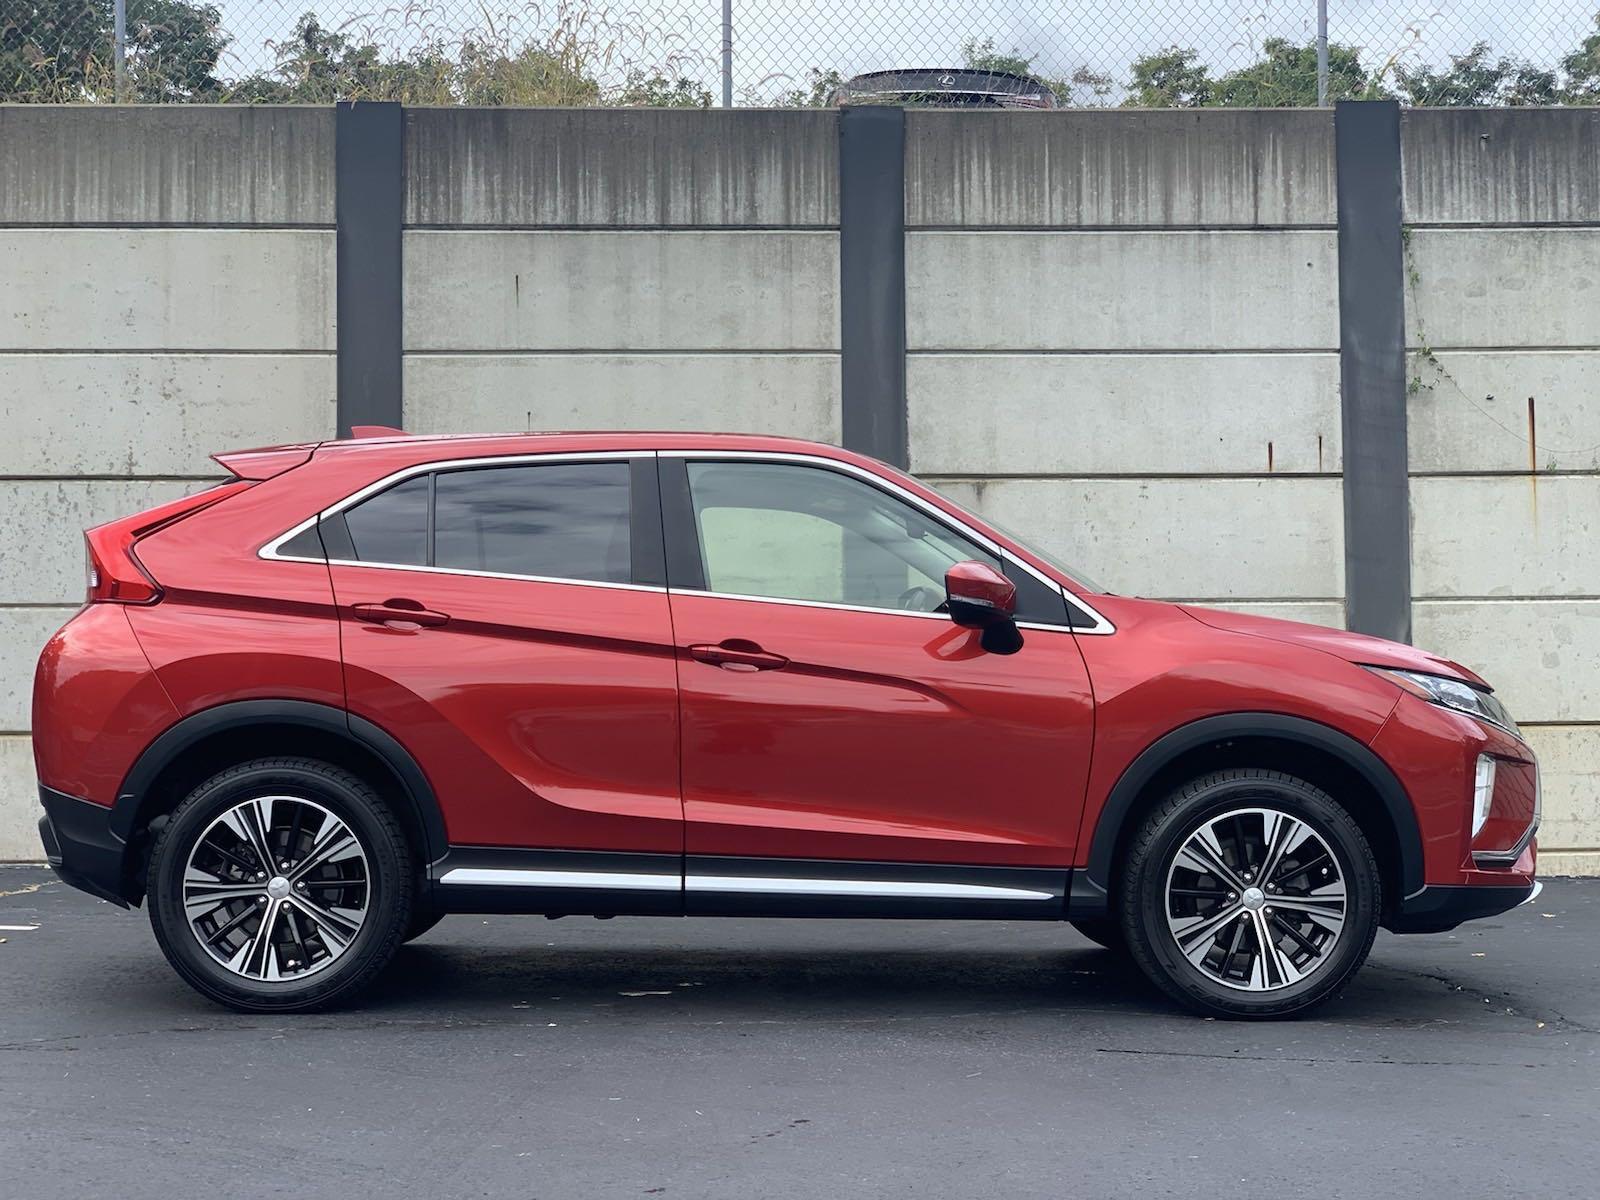 2018 Mitsubishi Eclipse Cross Sport Utility